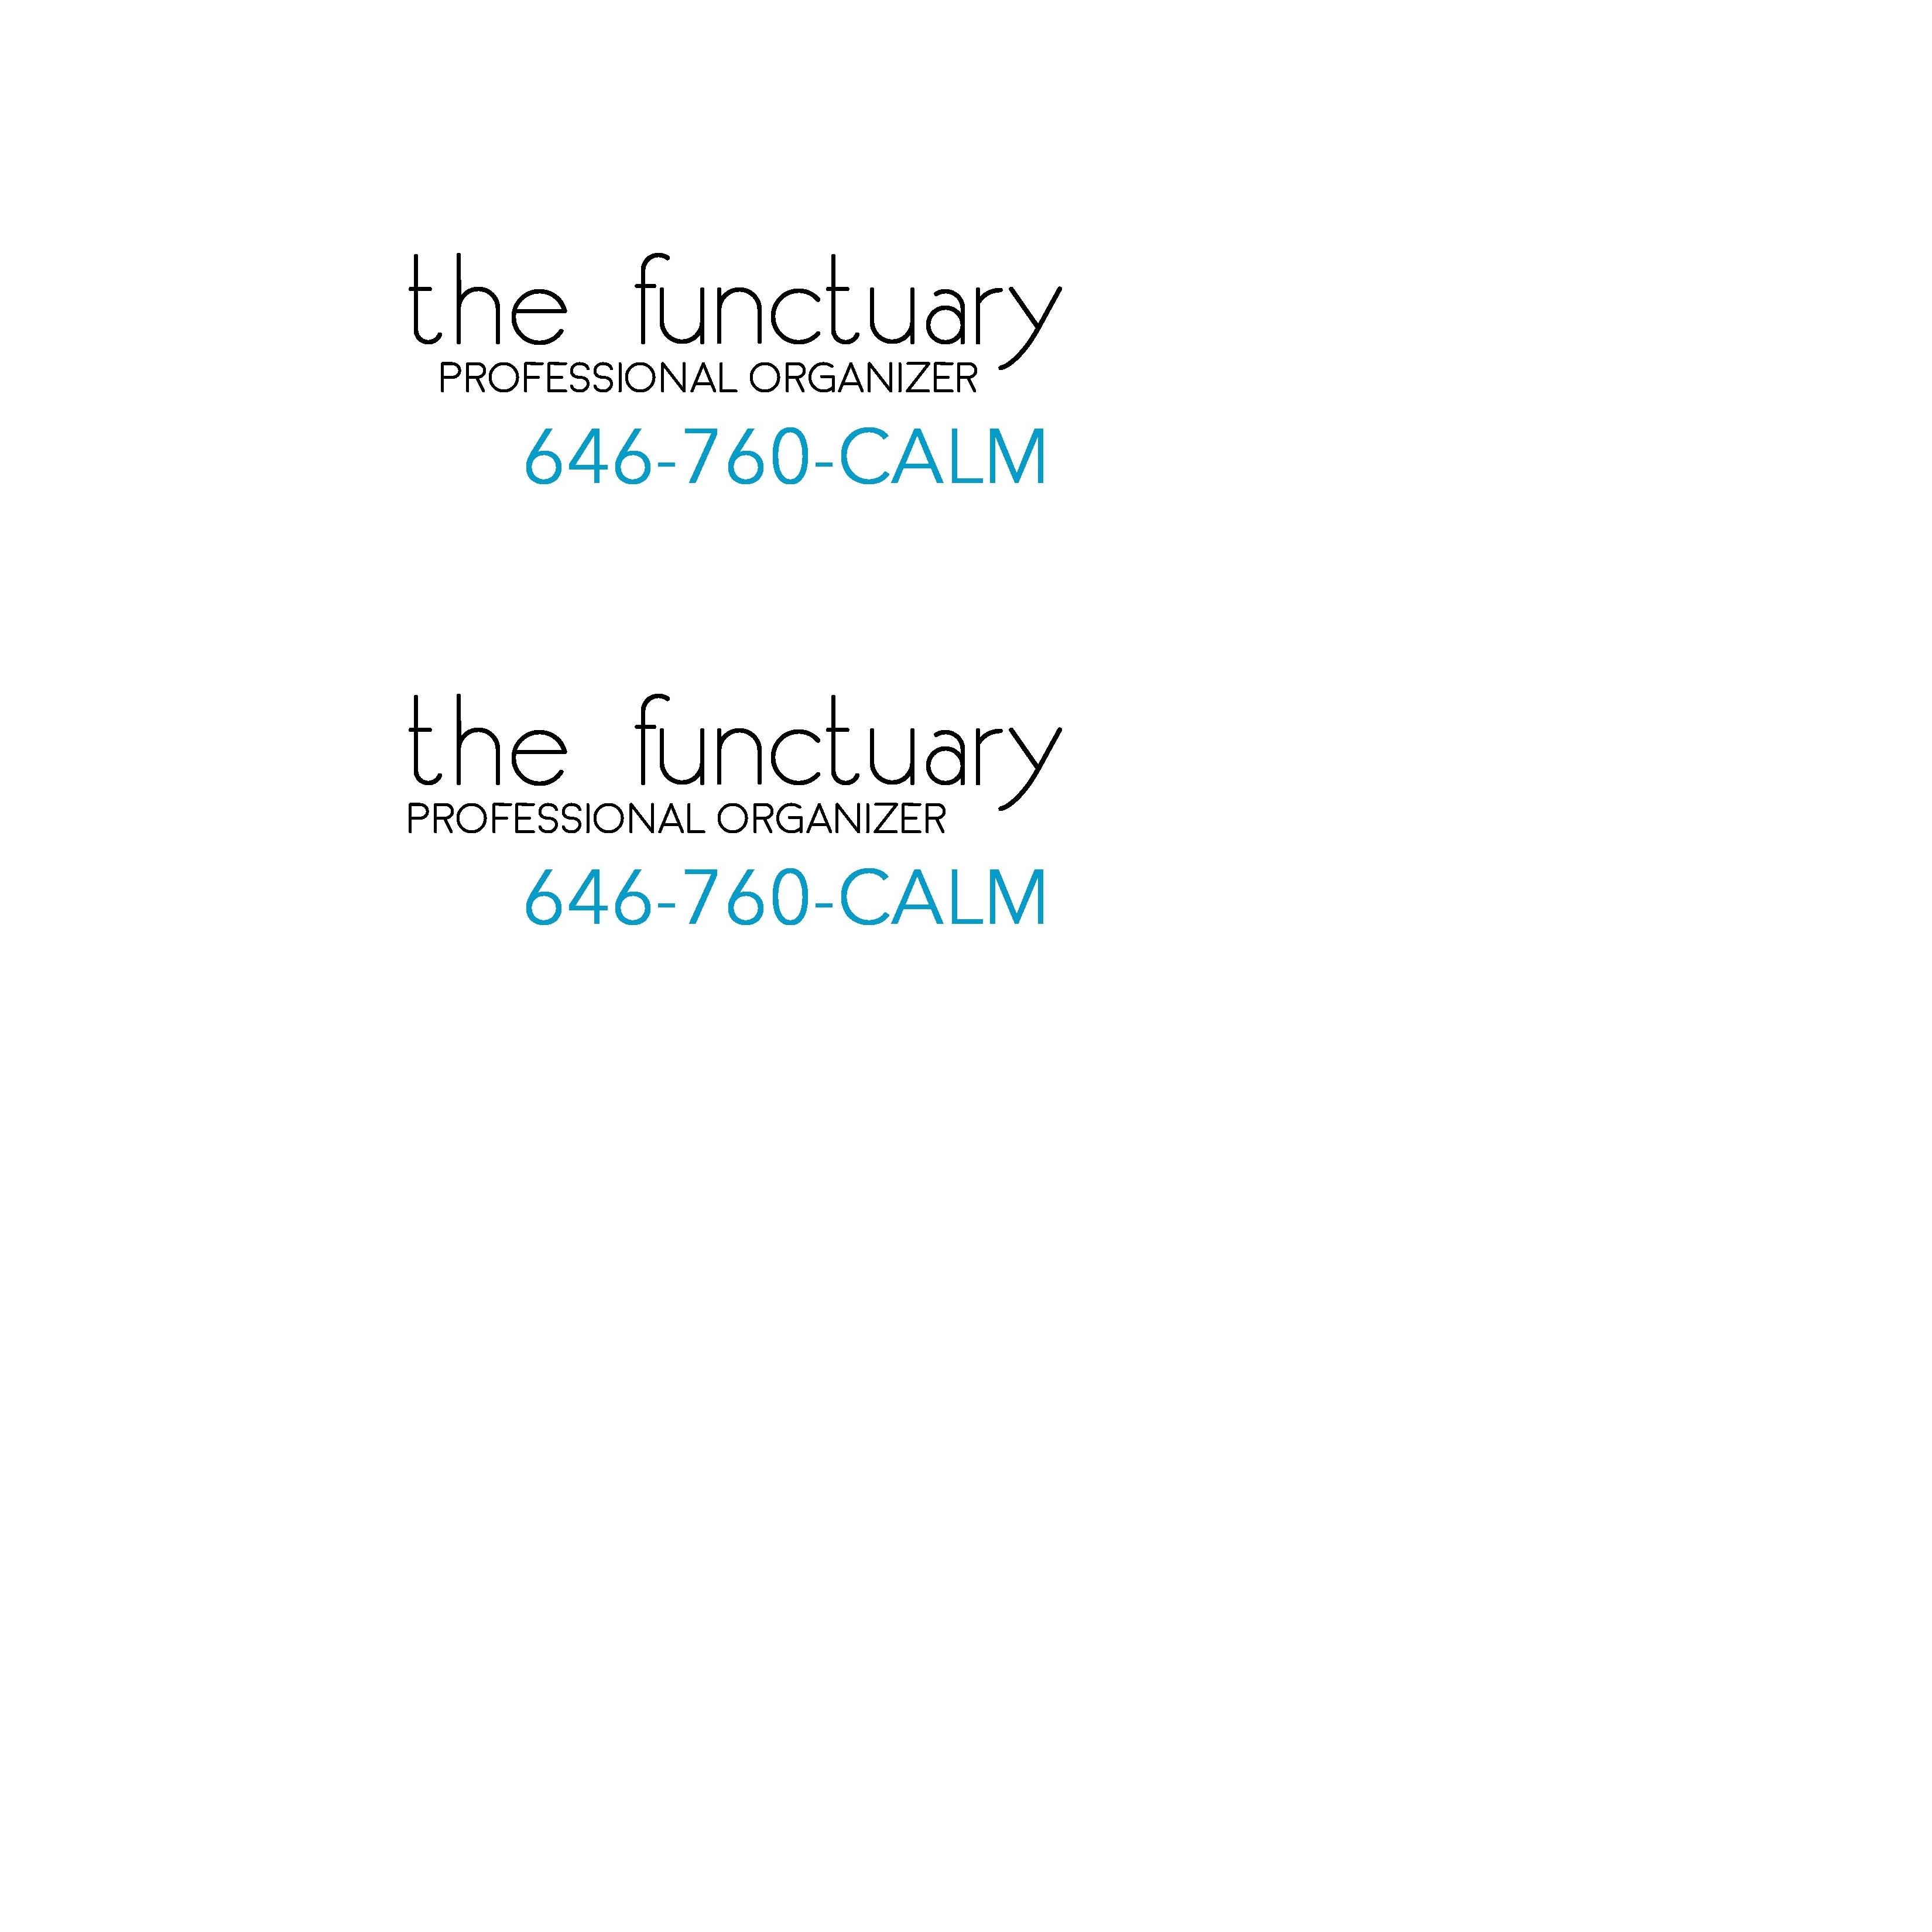 The Functuary